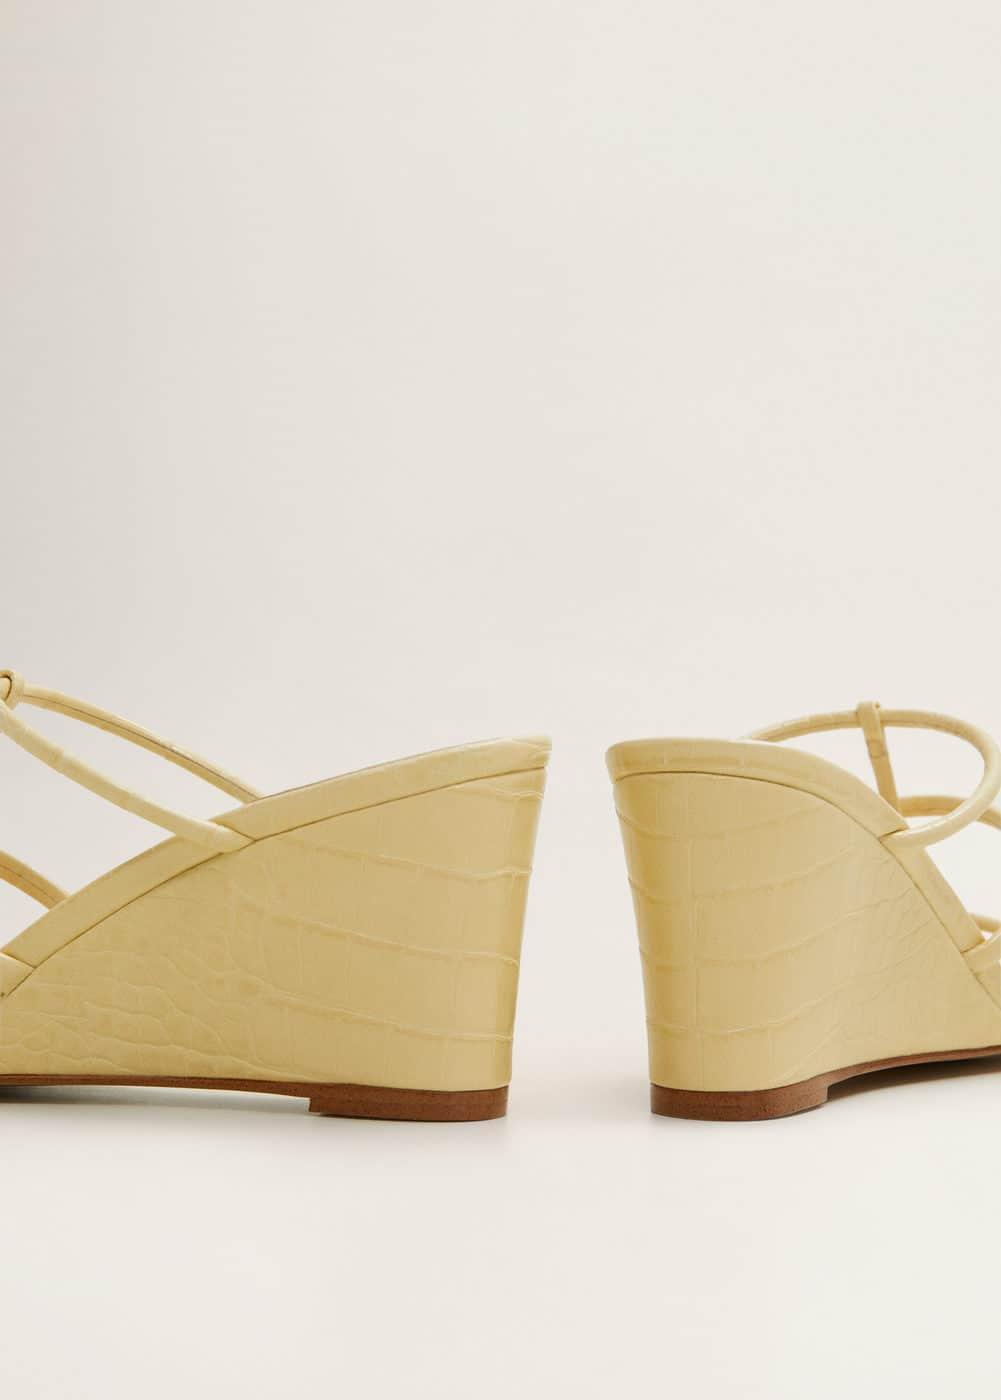 Sandales lanières plateforme  -  Femme | Mango France